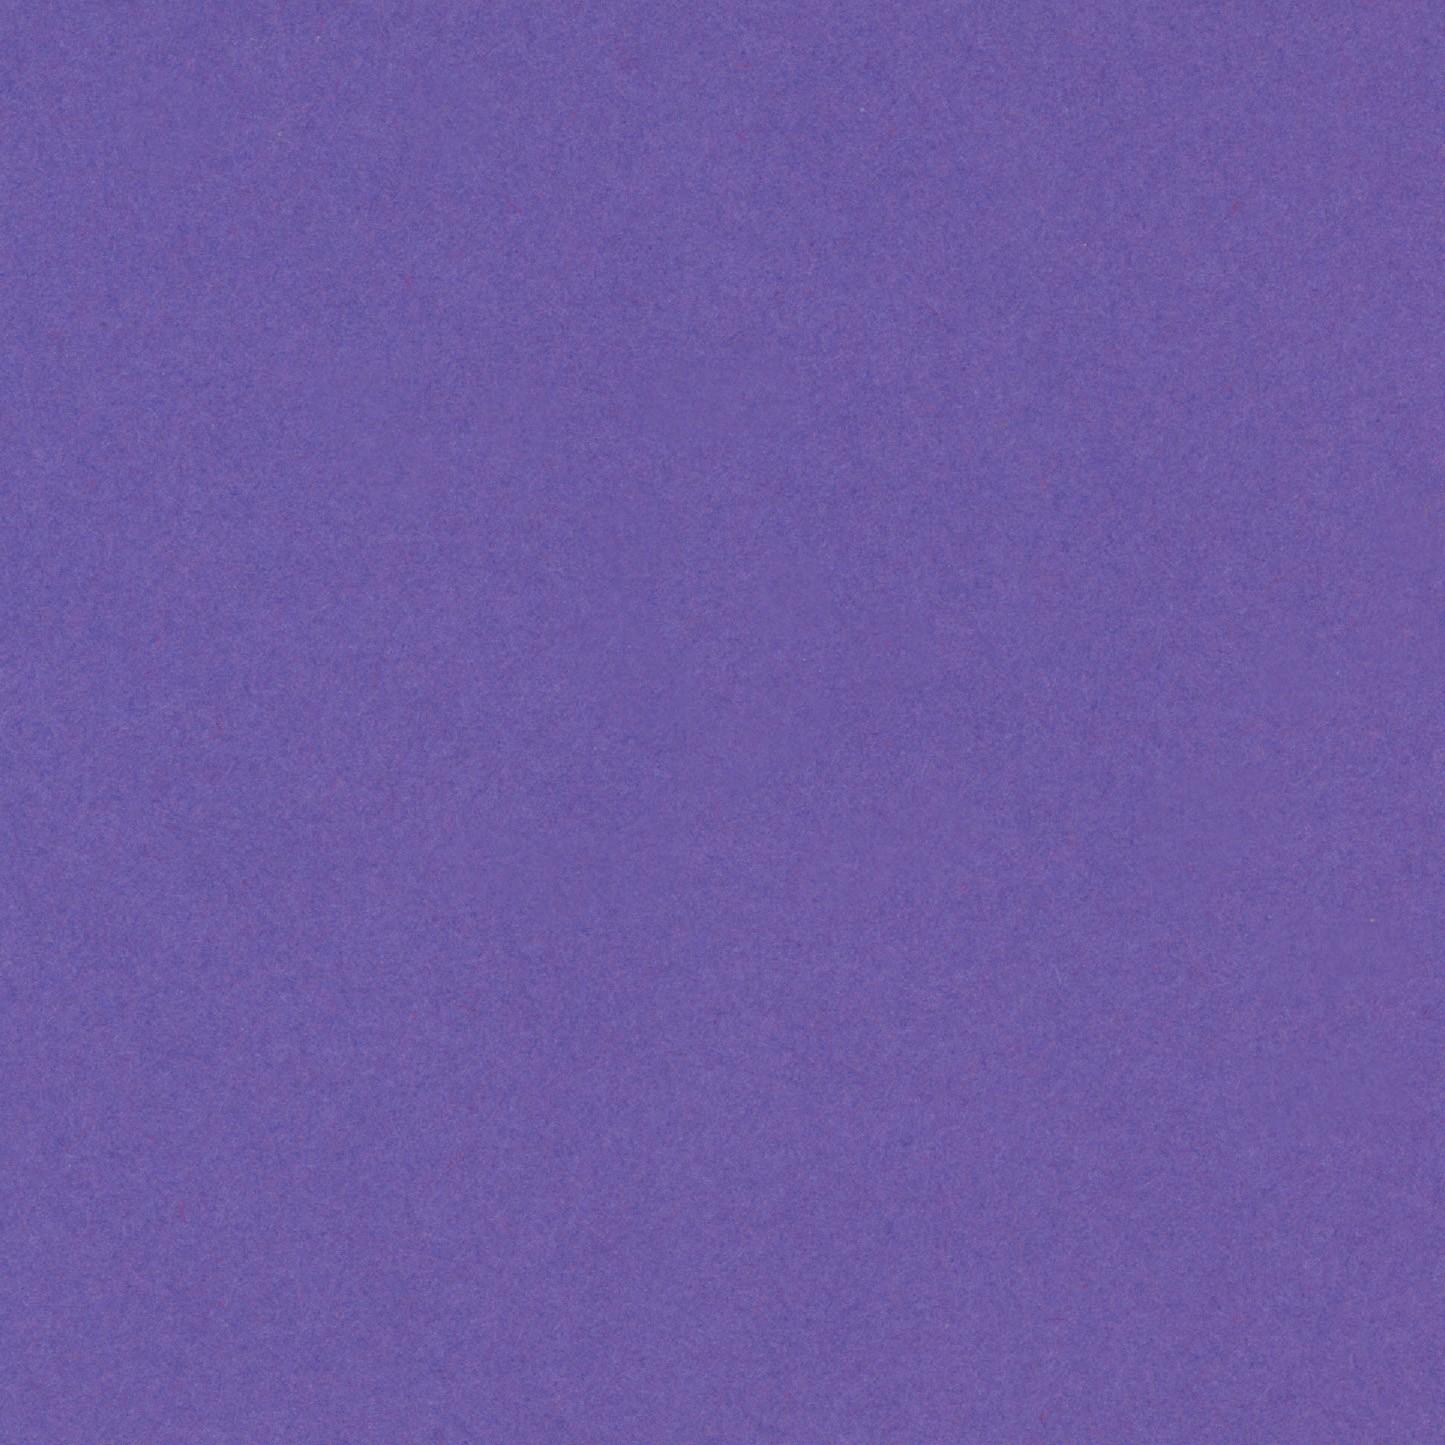 Purple - Purple 150gsm